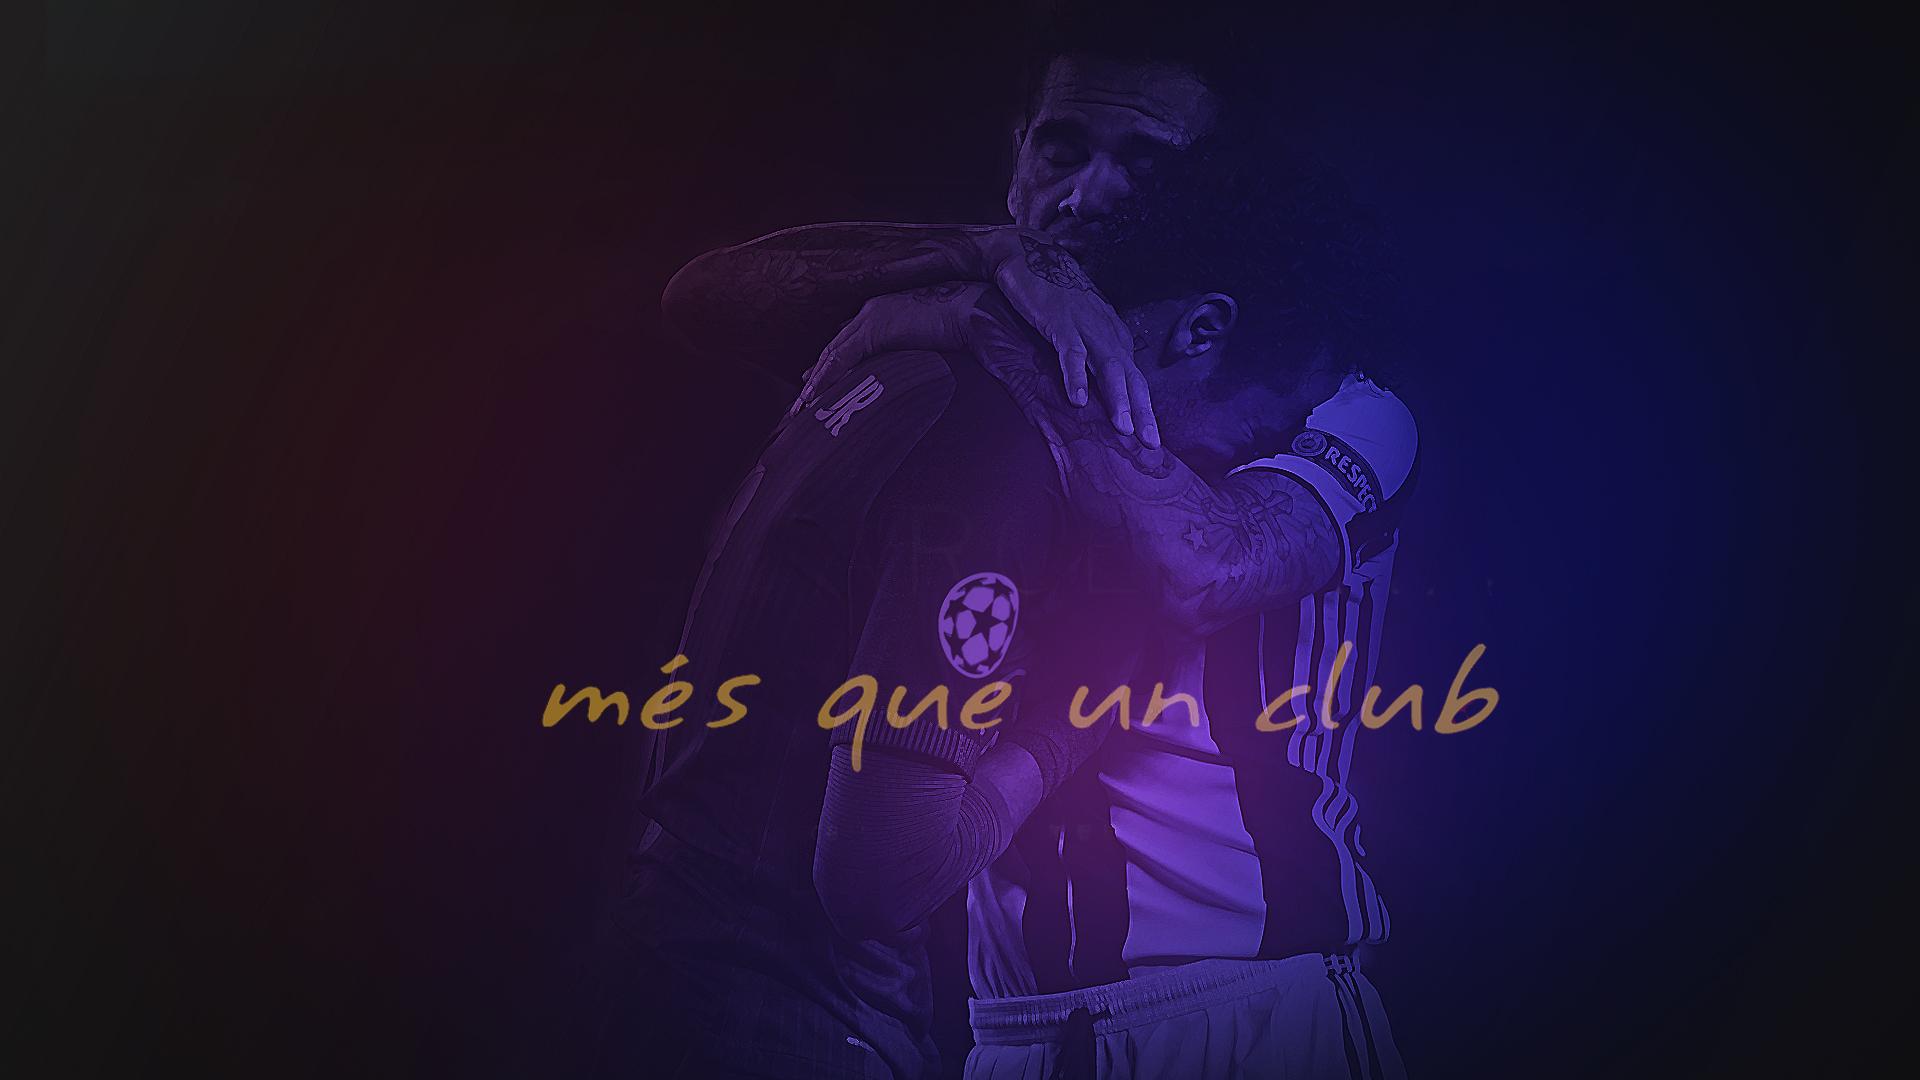 Fondos De Pantalla Del Fútbol Club Barcelona Wallpapers: Mes Que Un Club Fondo De Pantalla HD